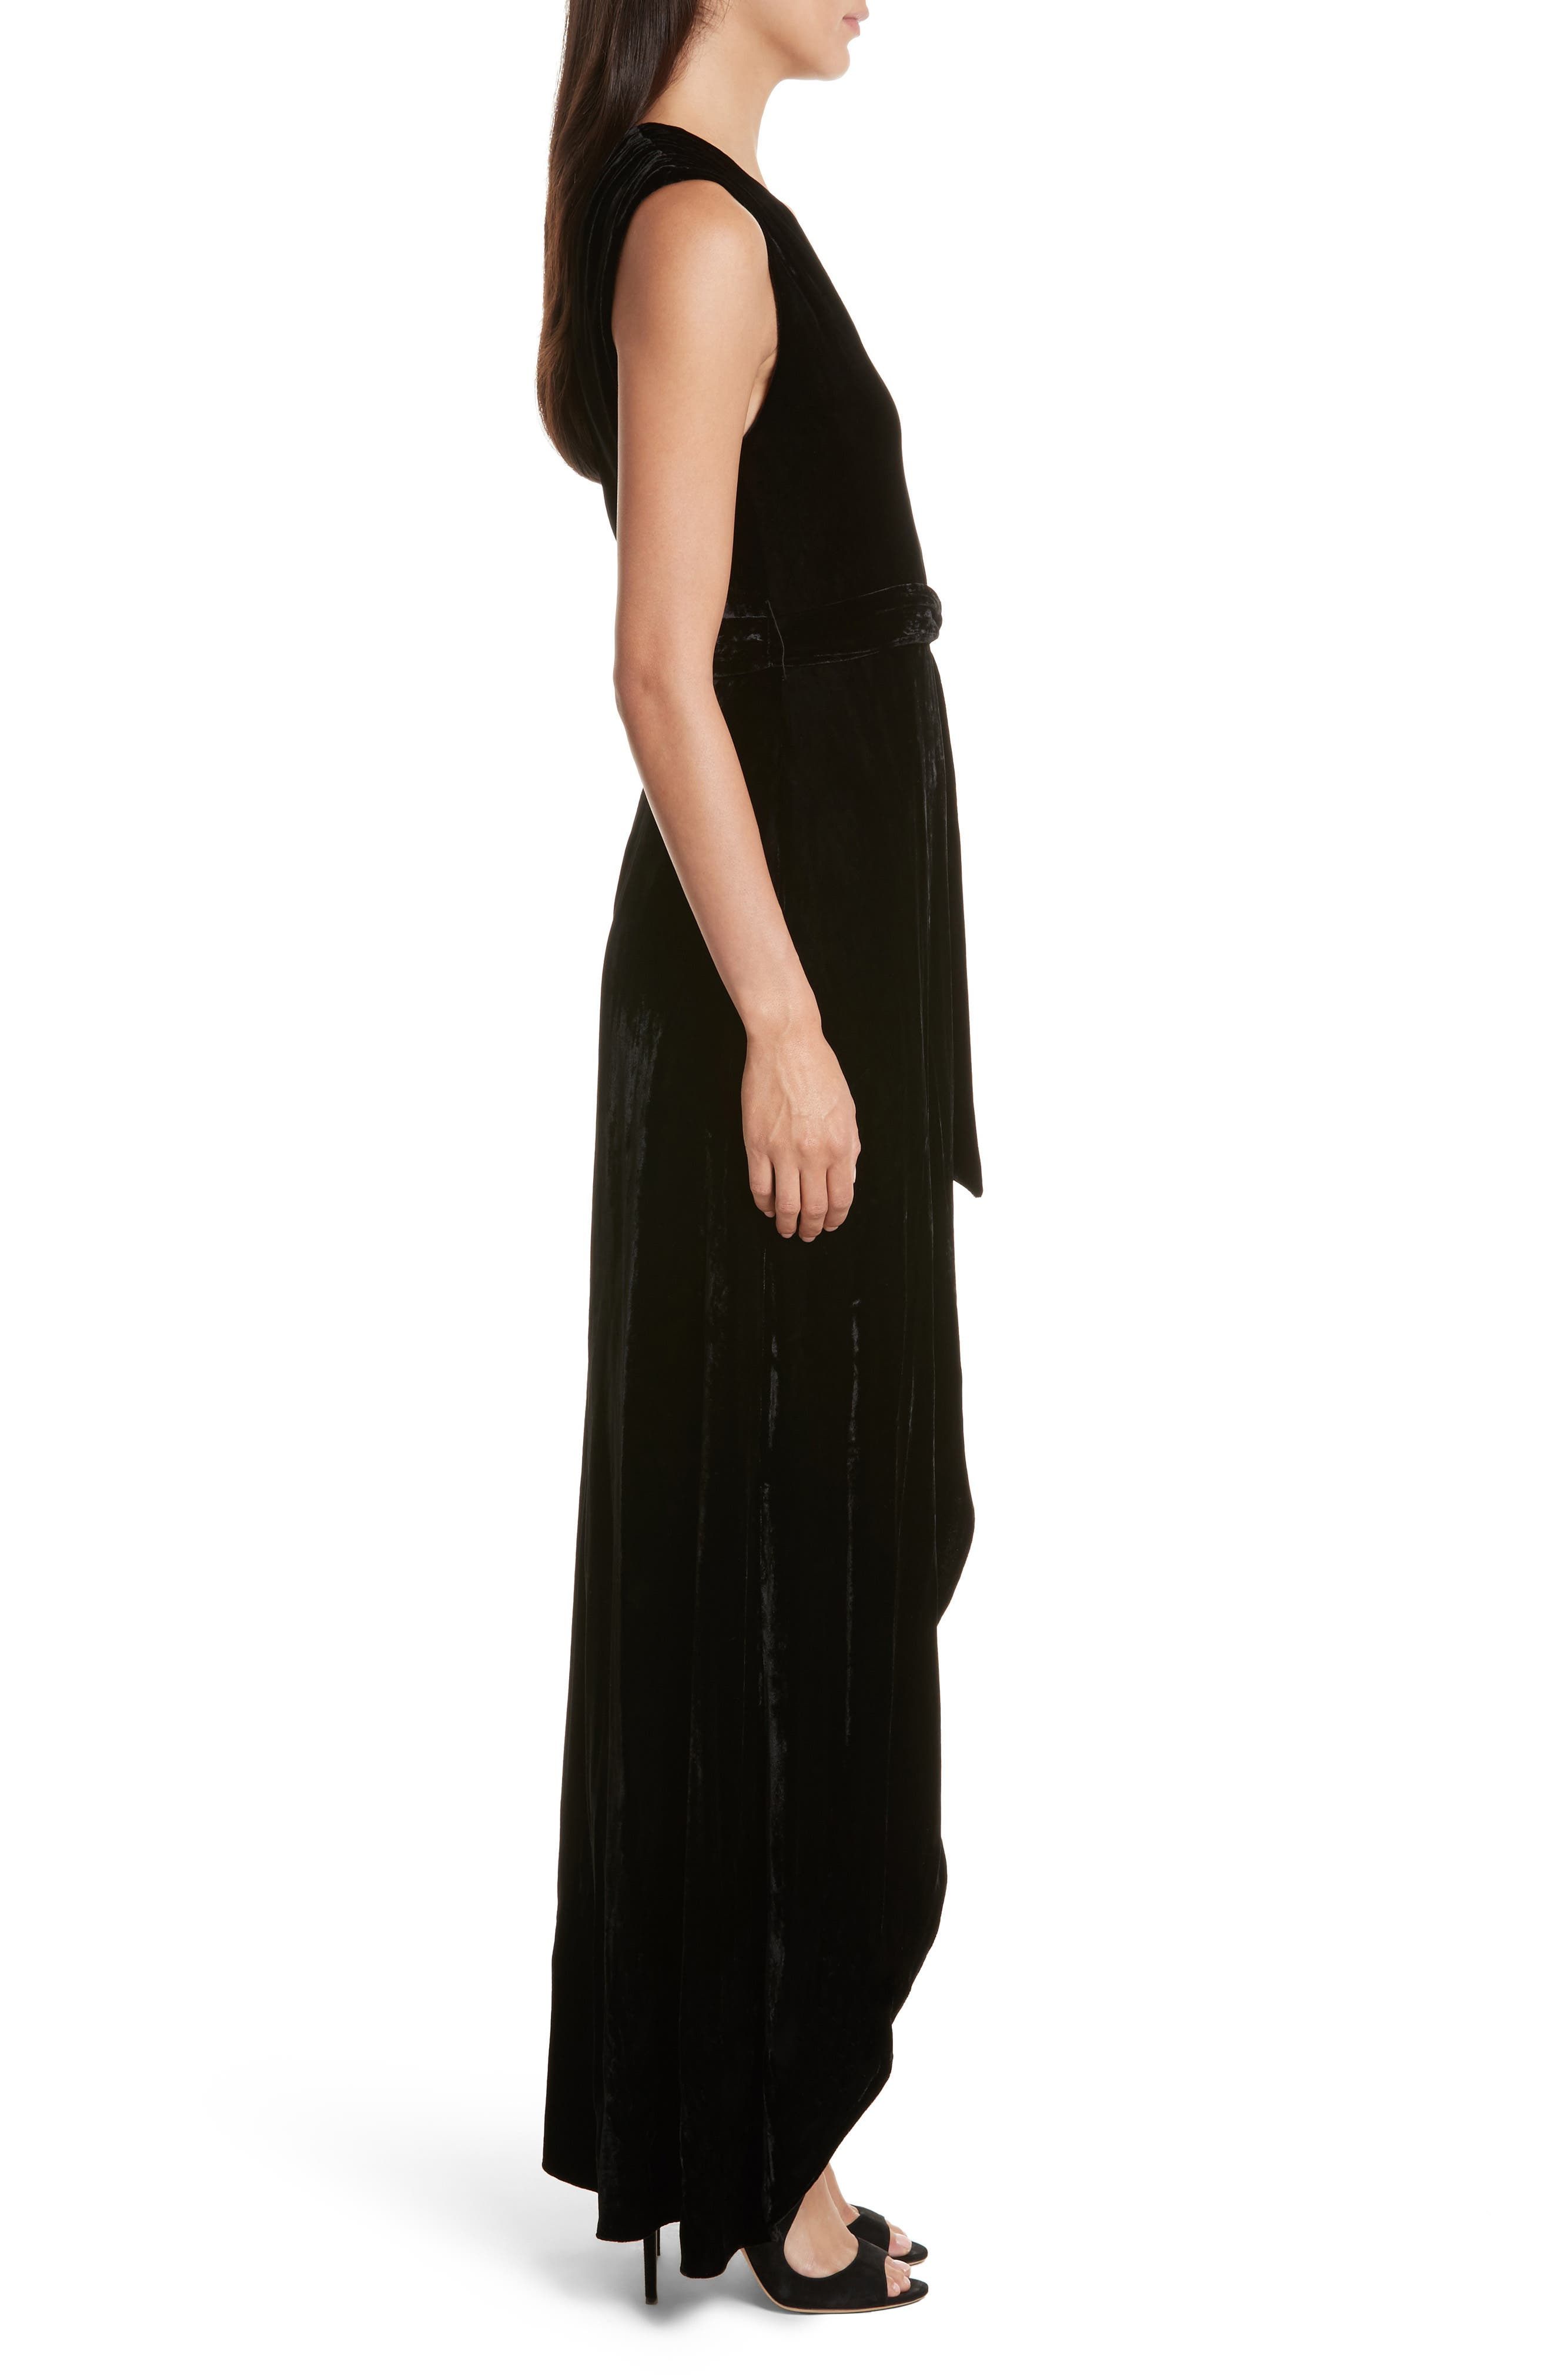 Simmons Velvet Wrap Maxi Dress,                             Alternate thumbnail 3, color,                             Black